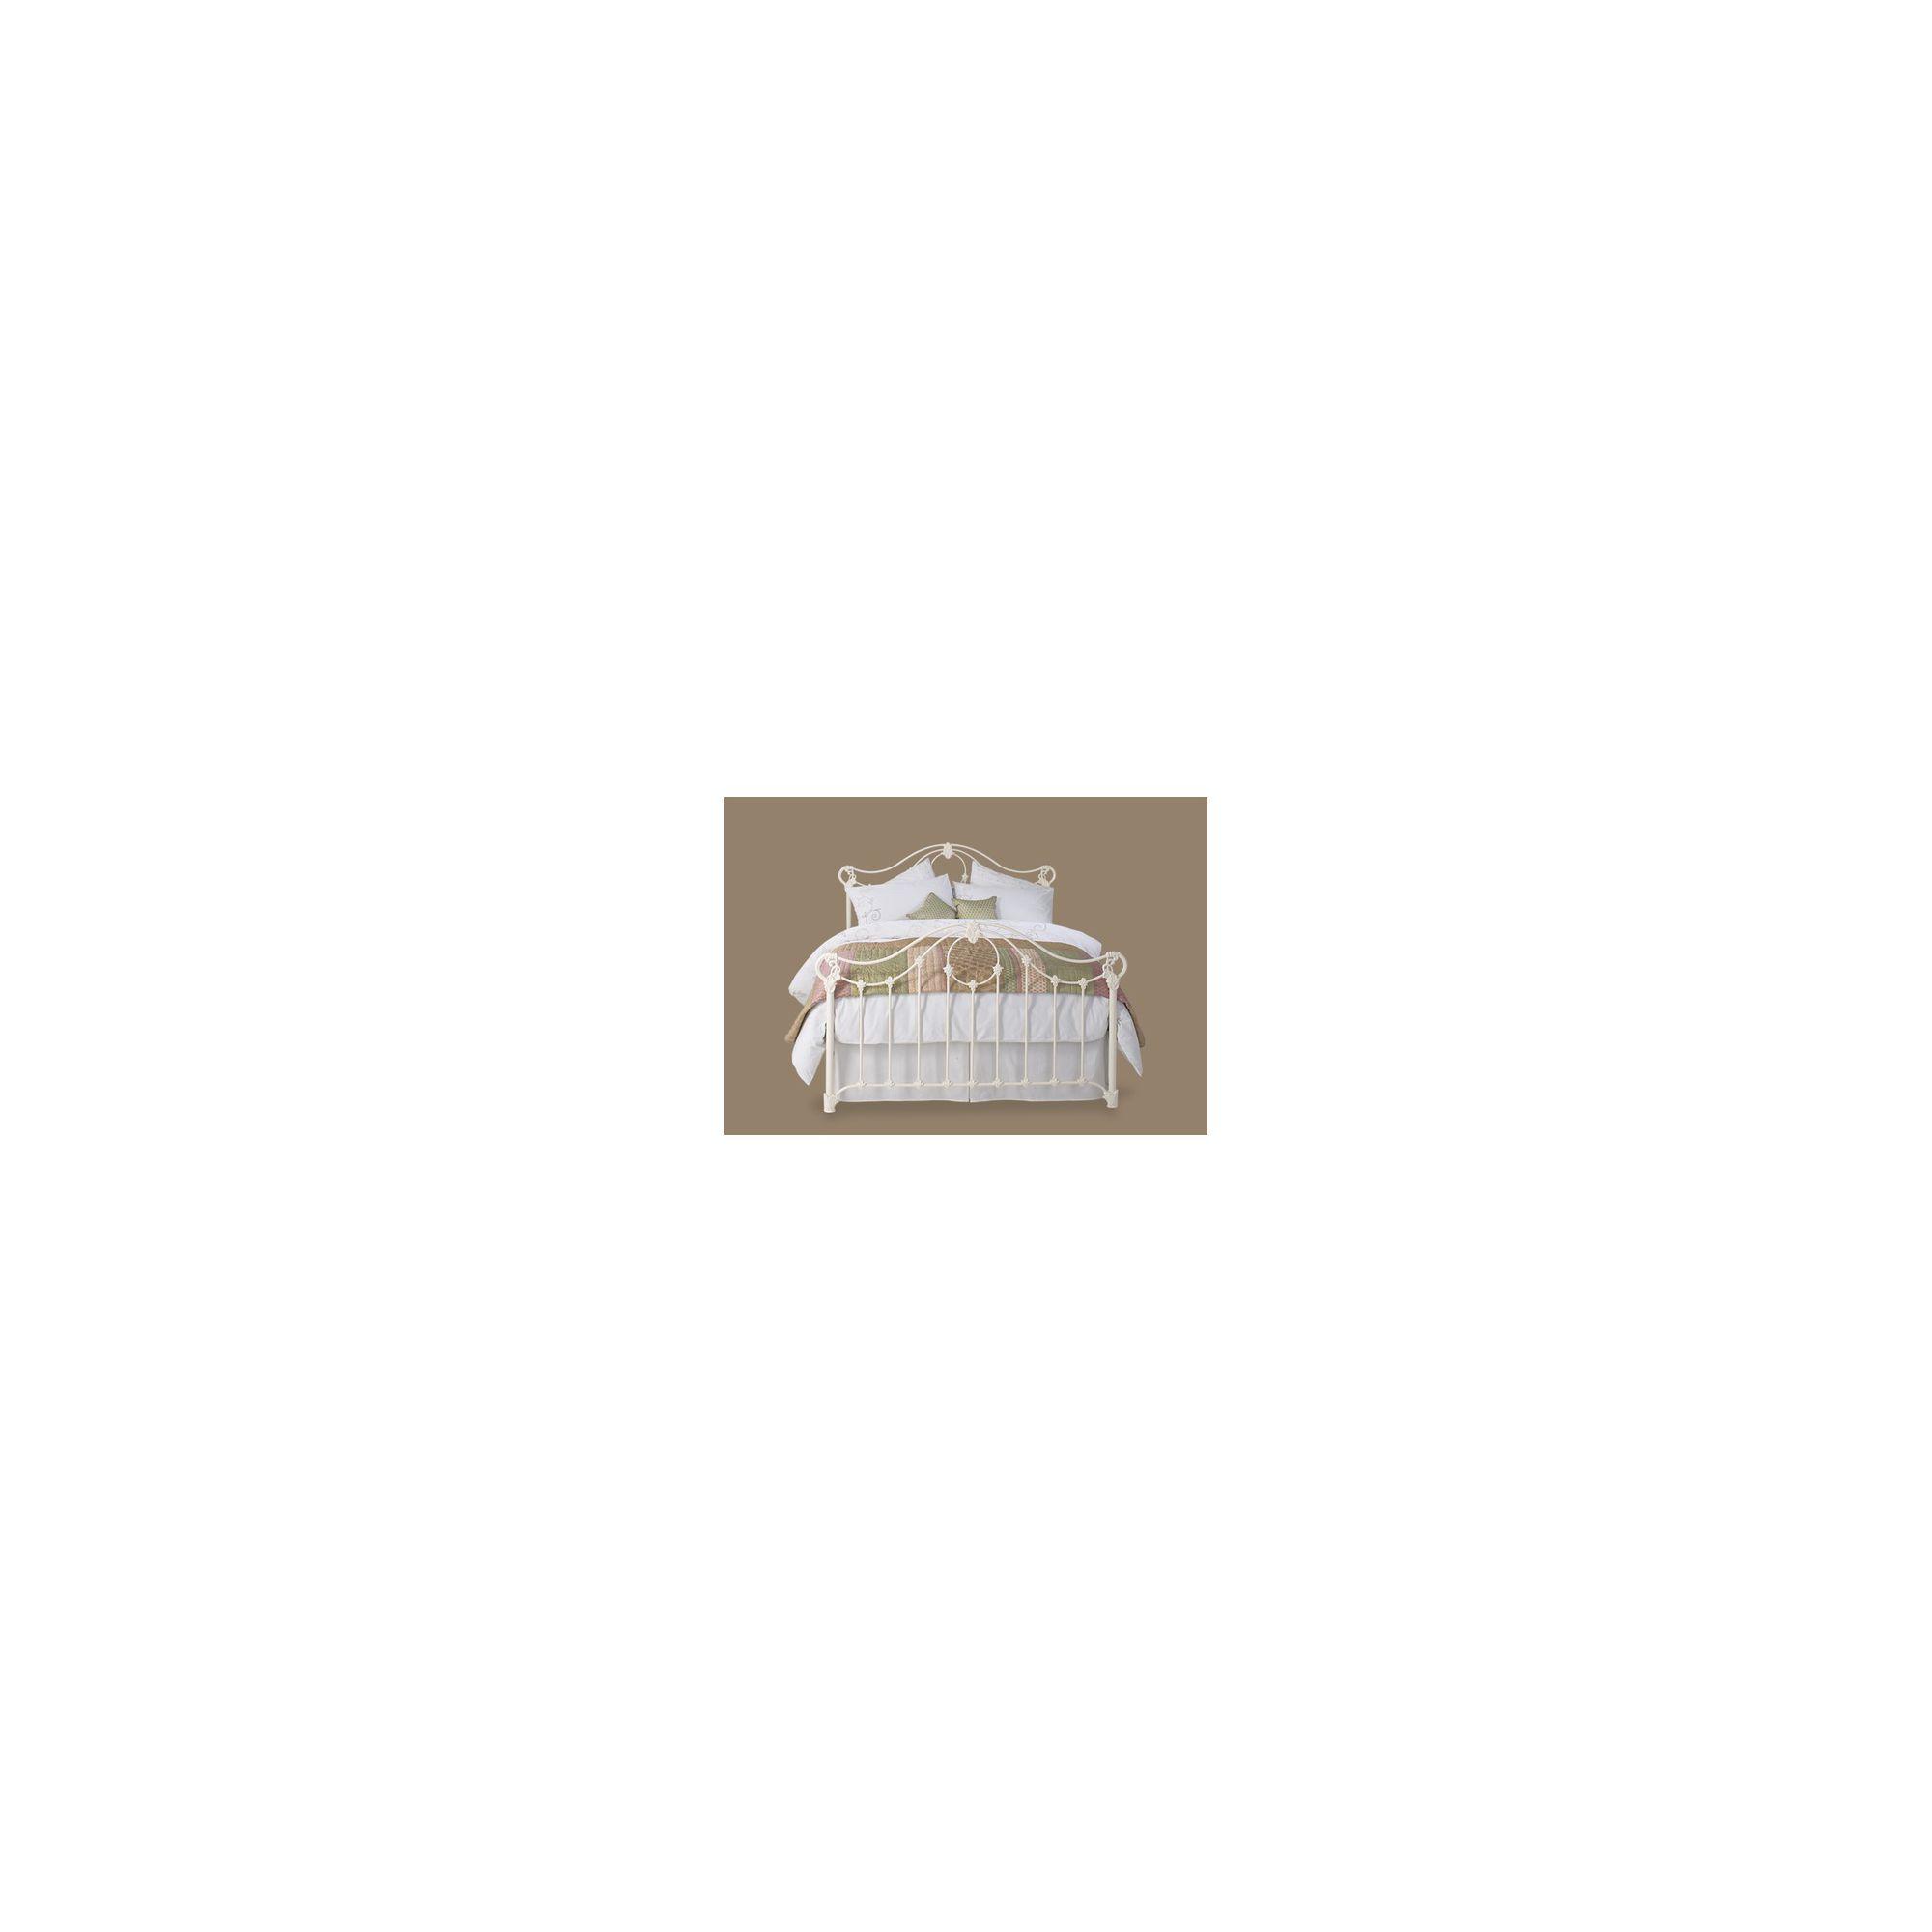 OBC Alva Bed Frame - King at Tescos Direct